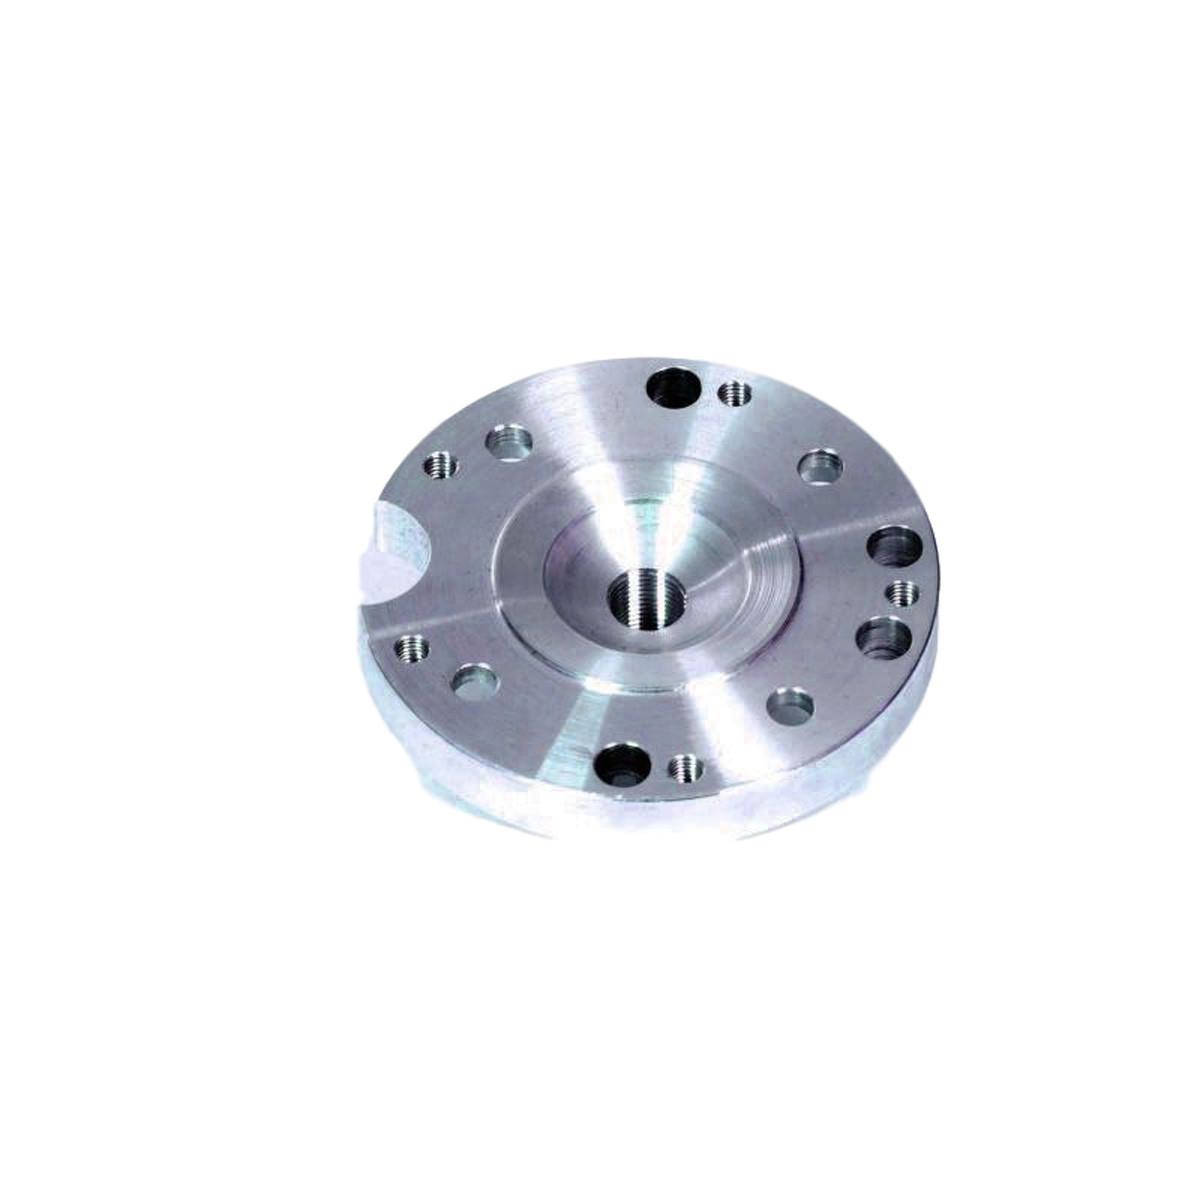 Plot de Culasse Nitro-Aerox 50,6mm - MVT